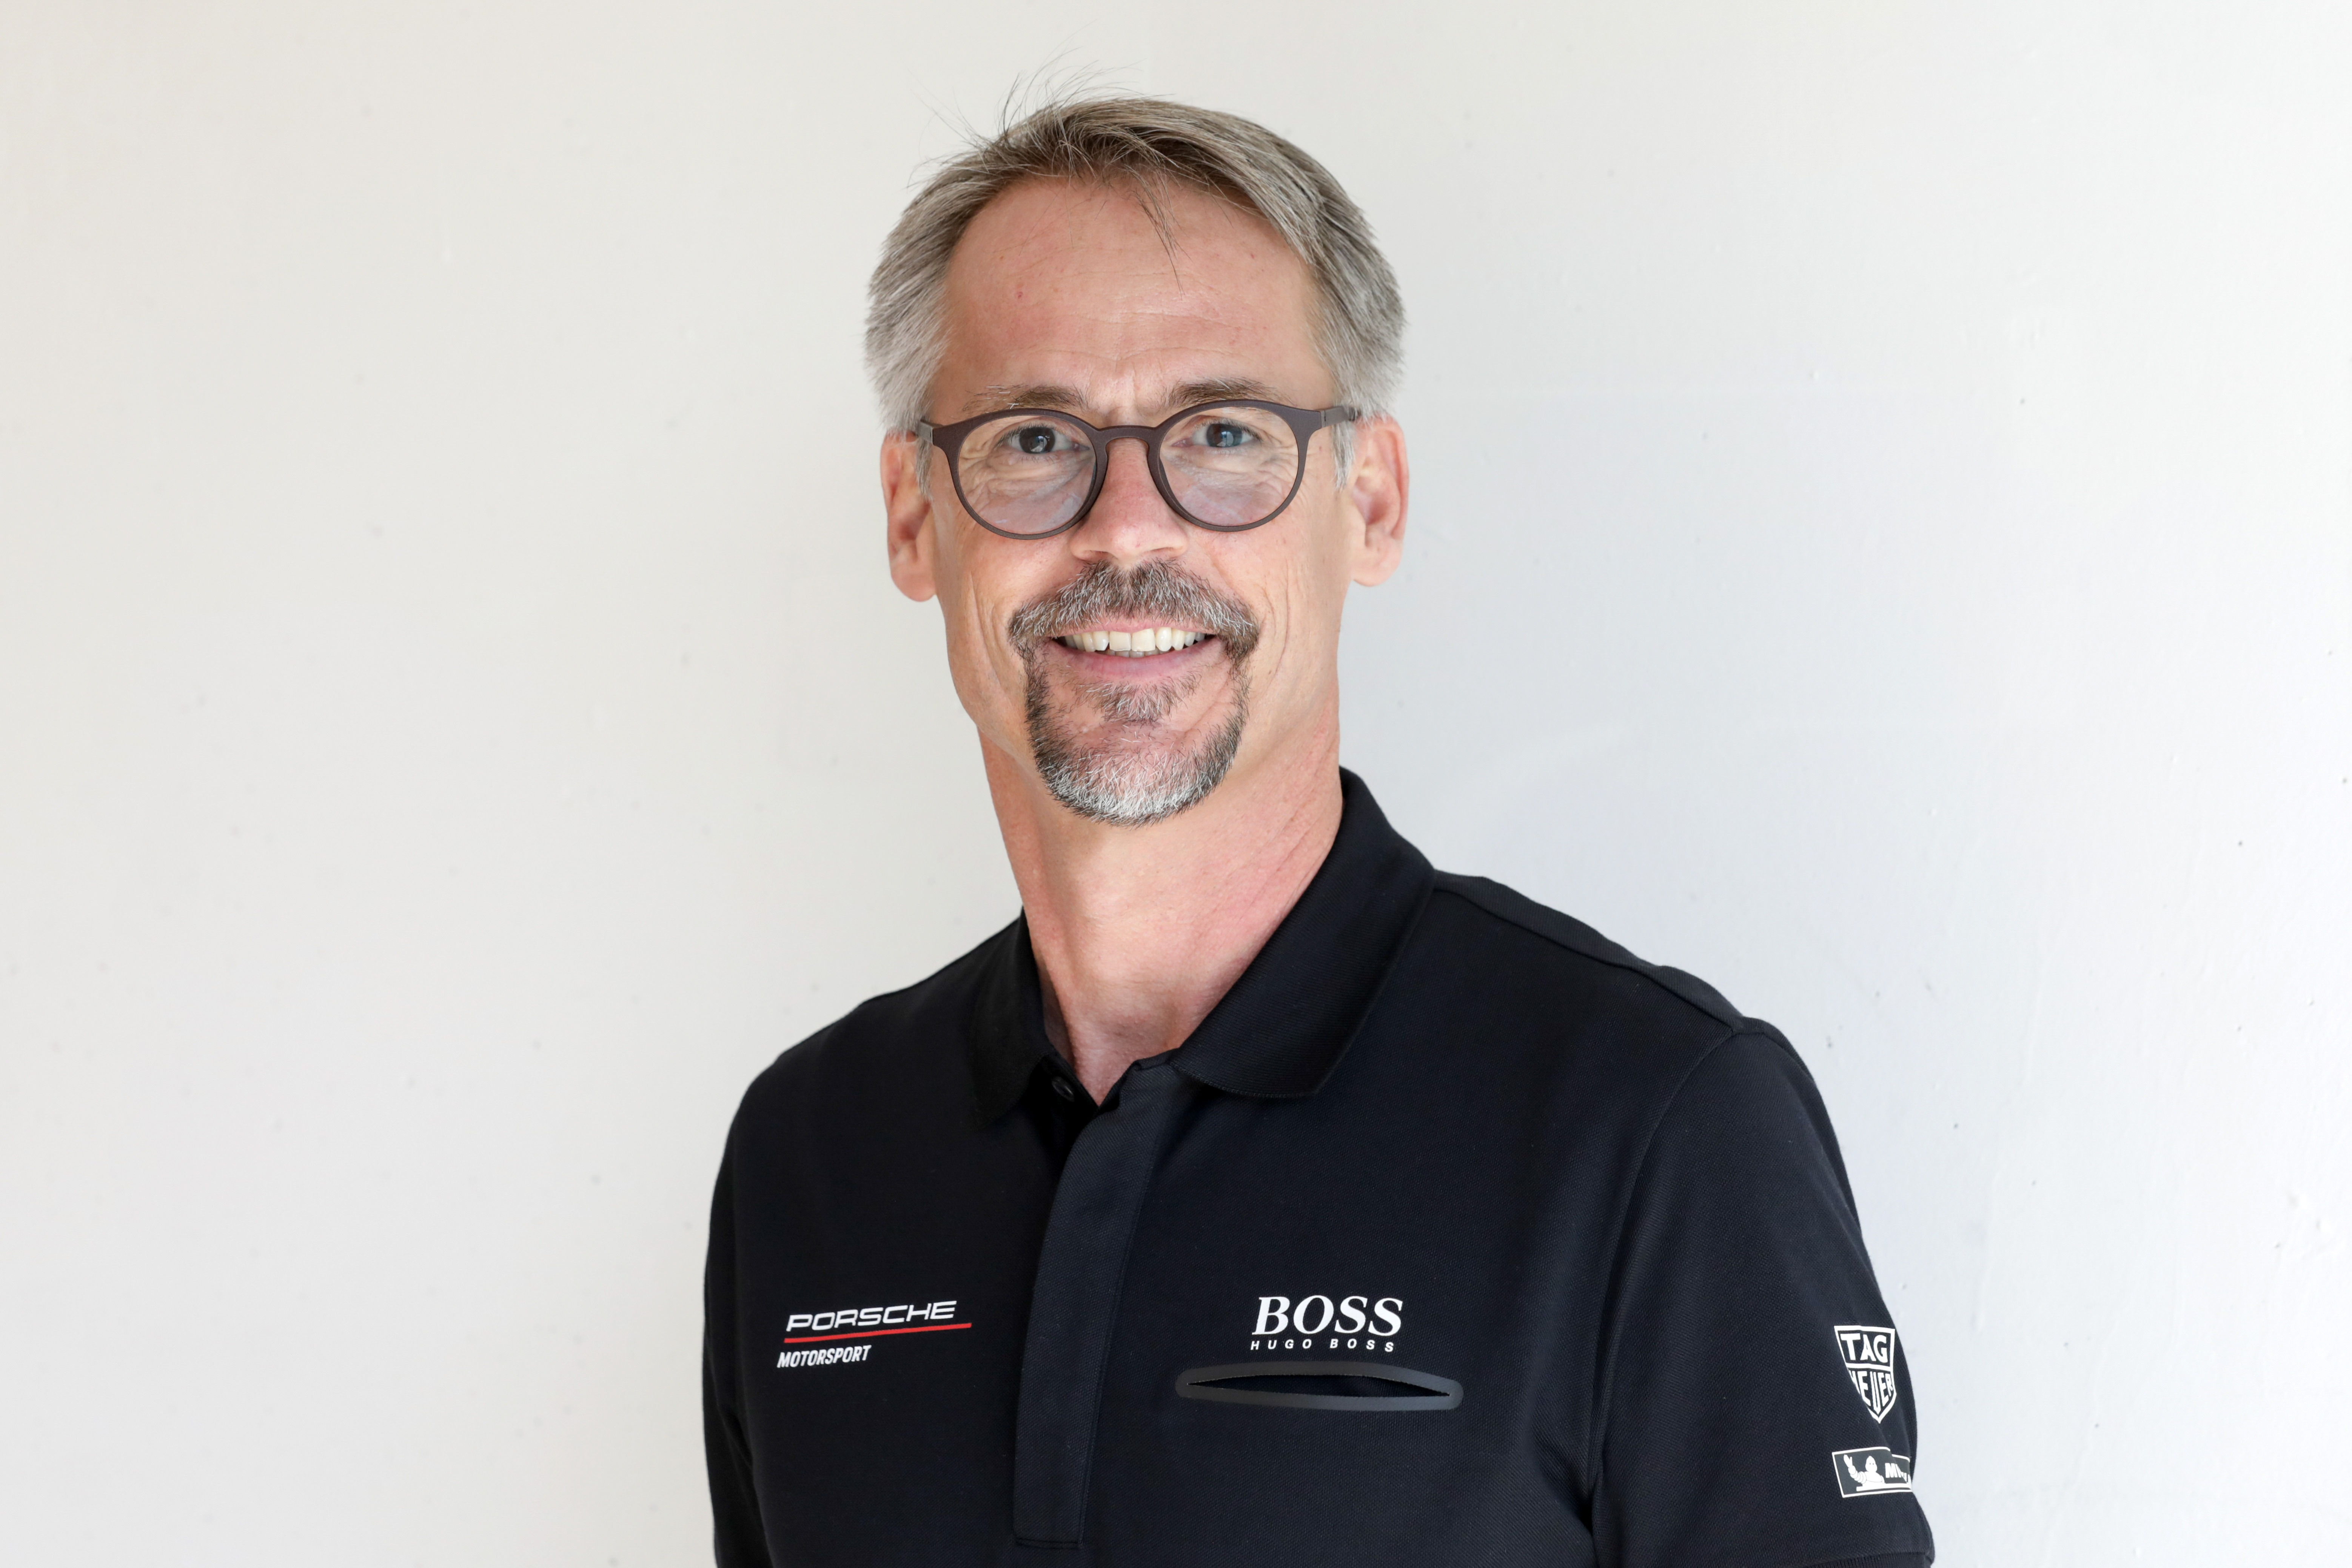 Thomas Laudenbach, Porsche Motorsport